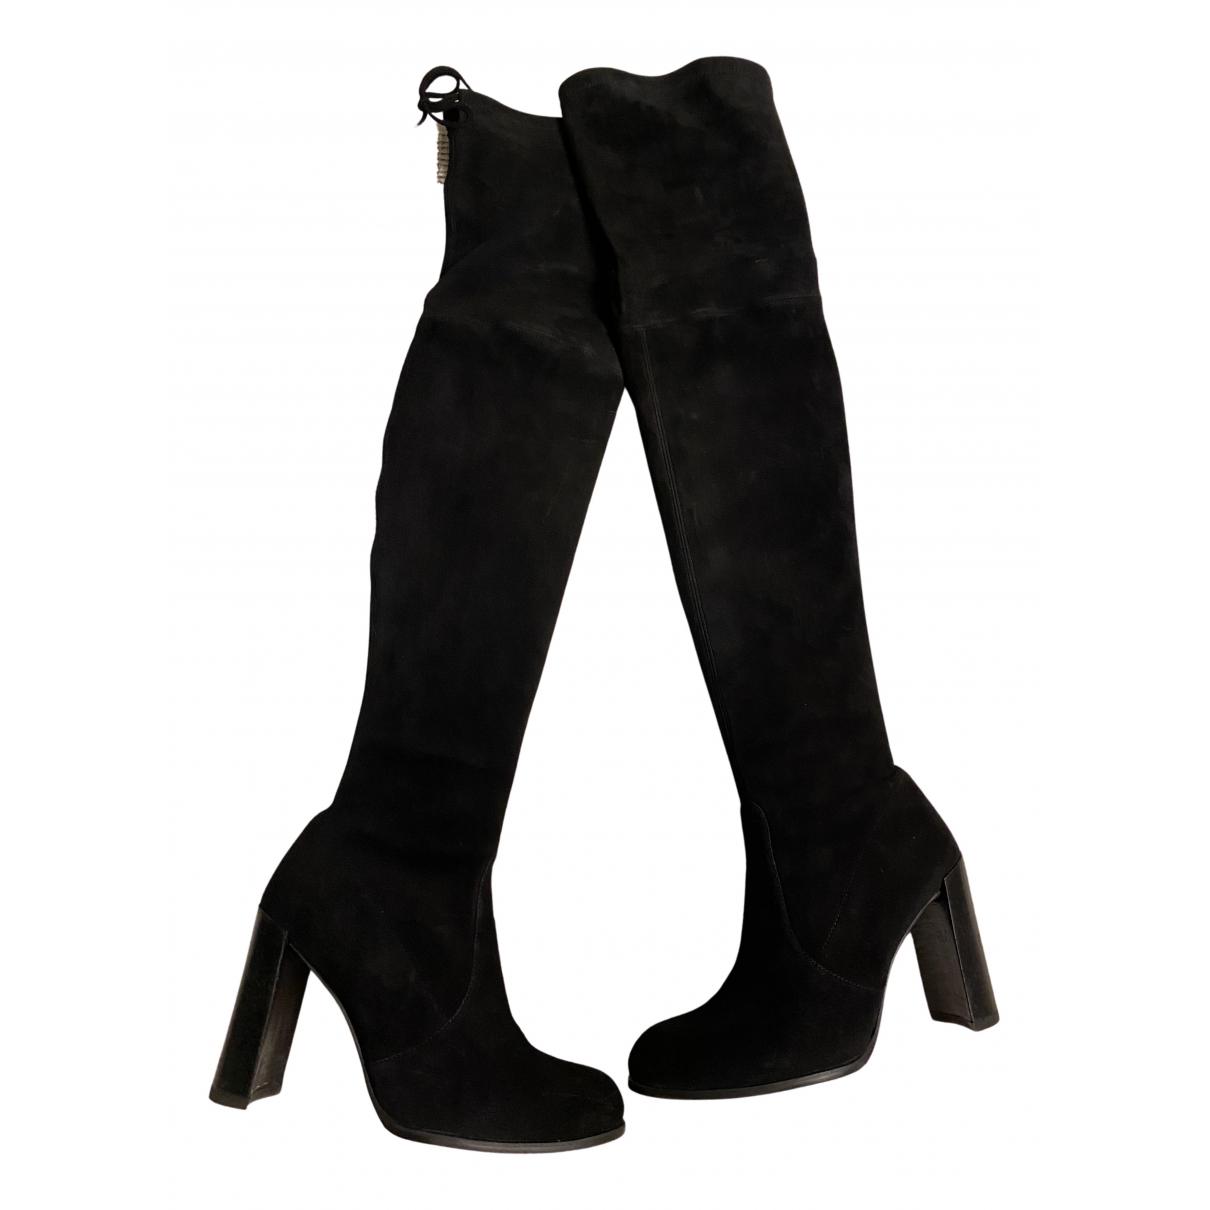 Stuart Weitzman N Black Suede Boots for Women 37.5 IT